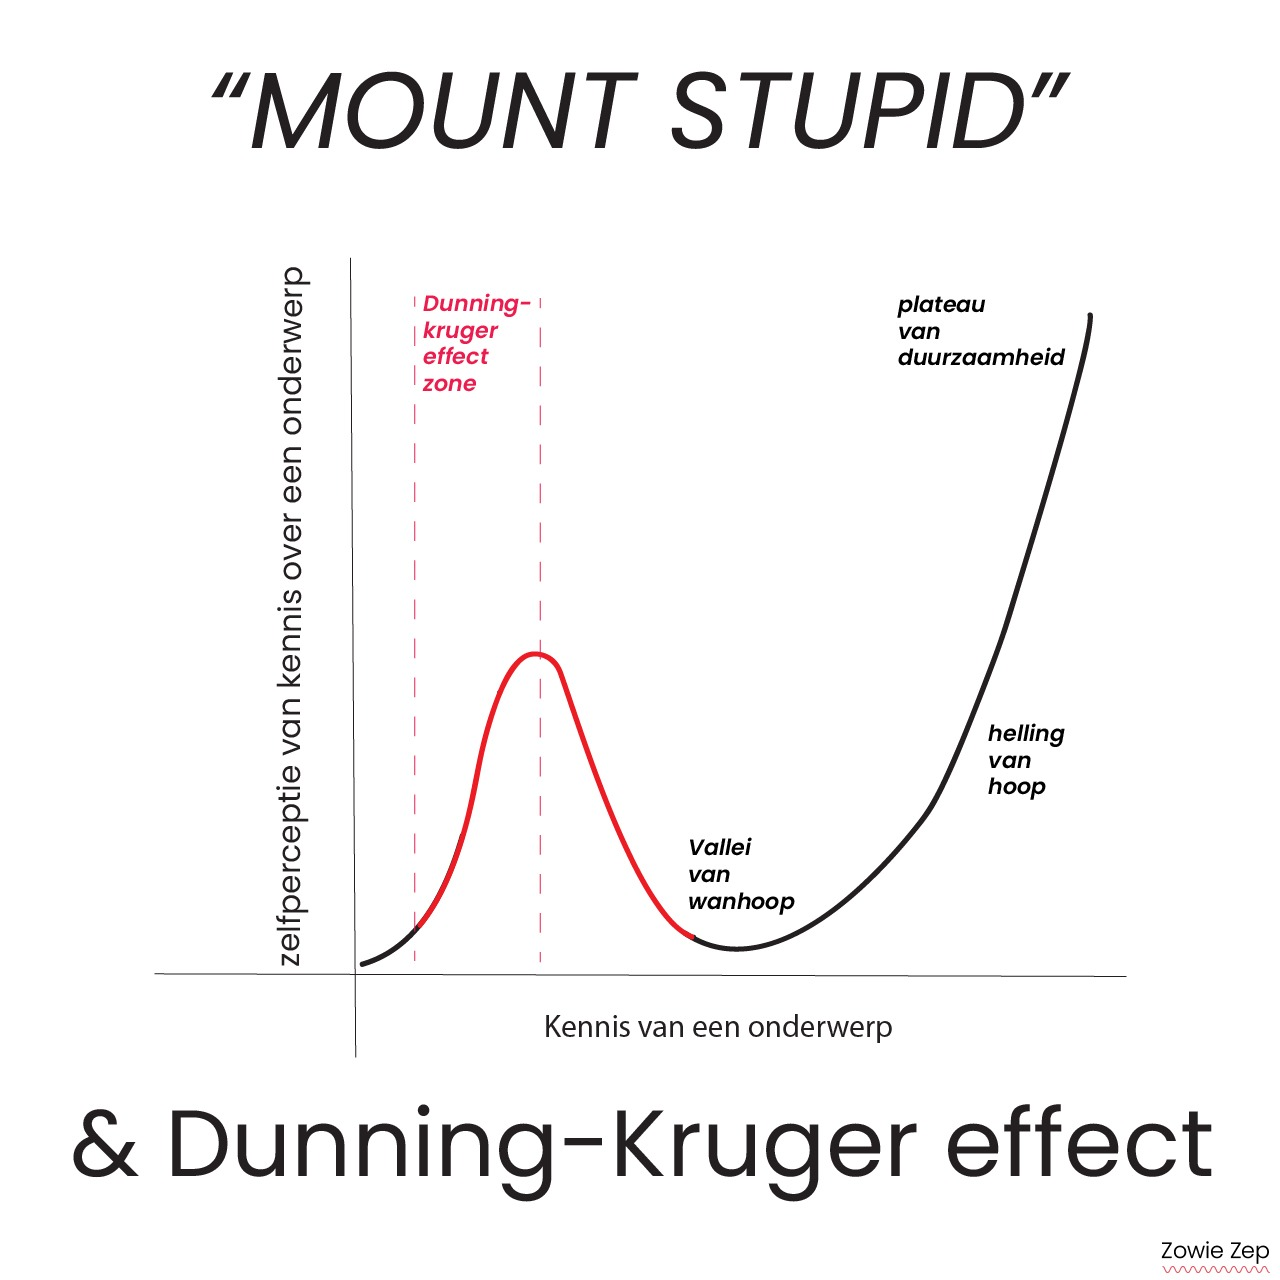 Mount Stupid & Dunning-Kruger effectzone